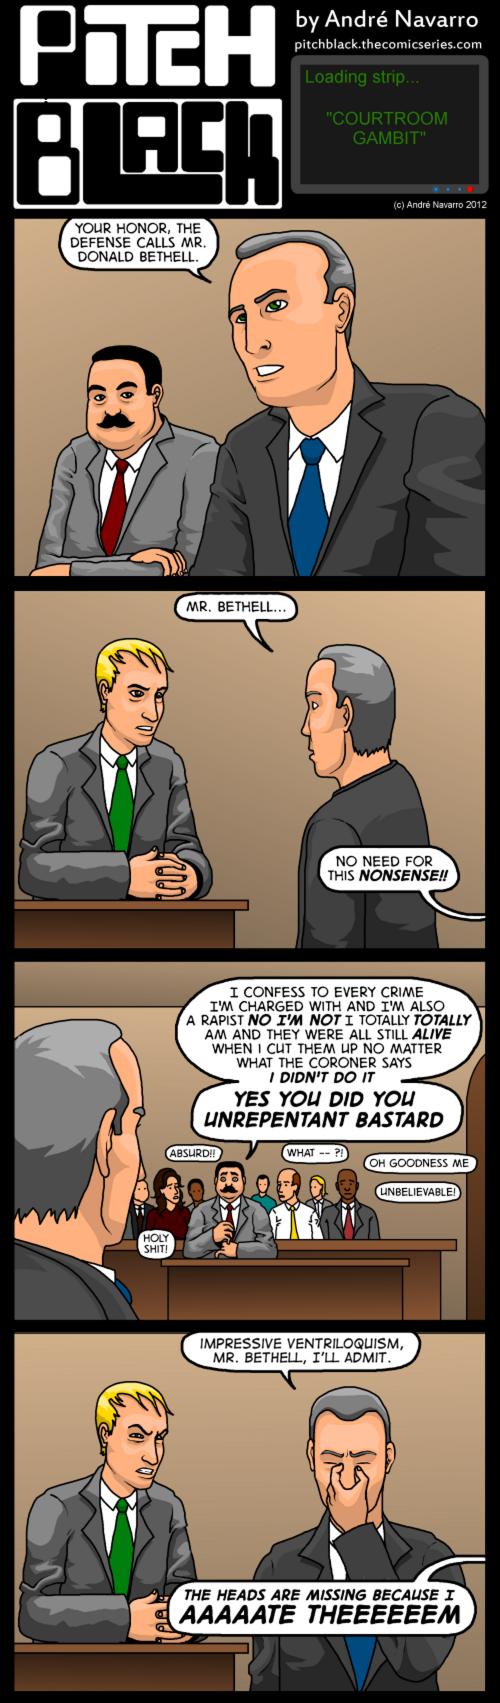 Courtroom Gambit